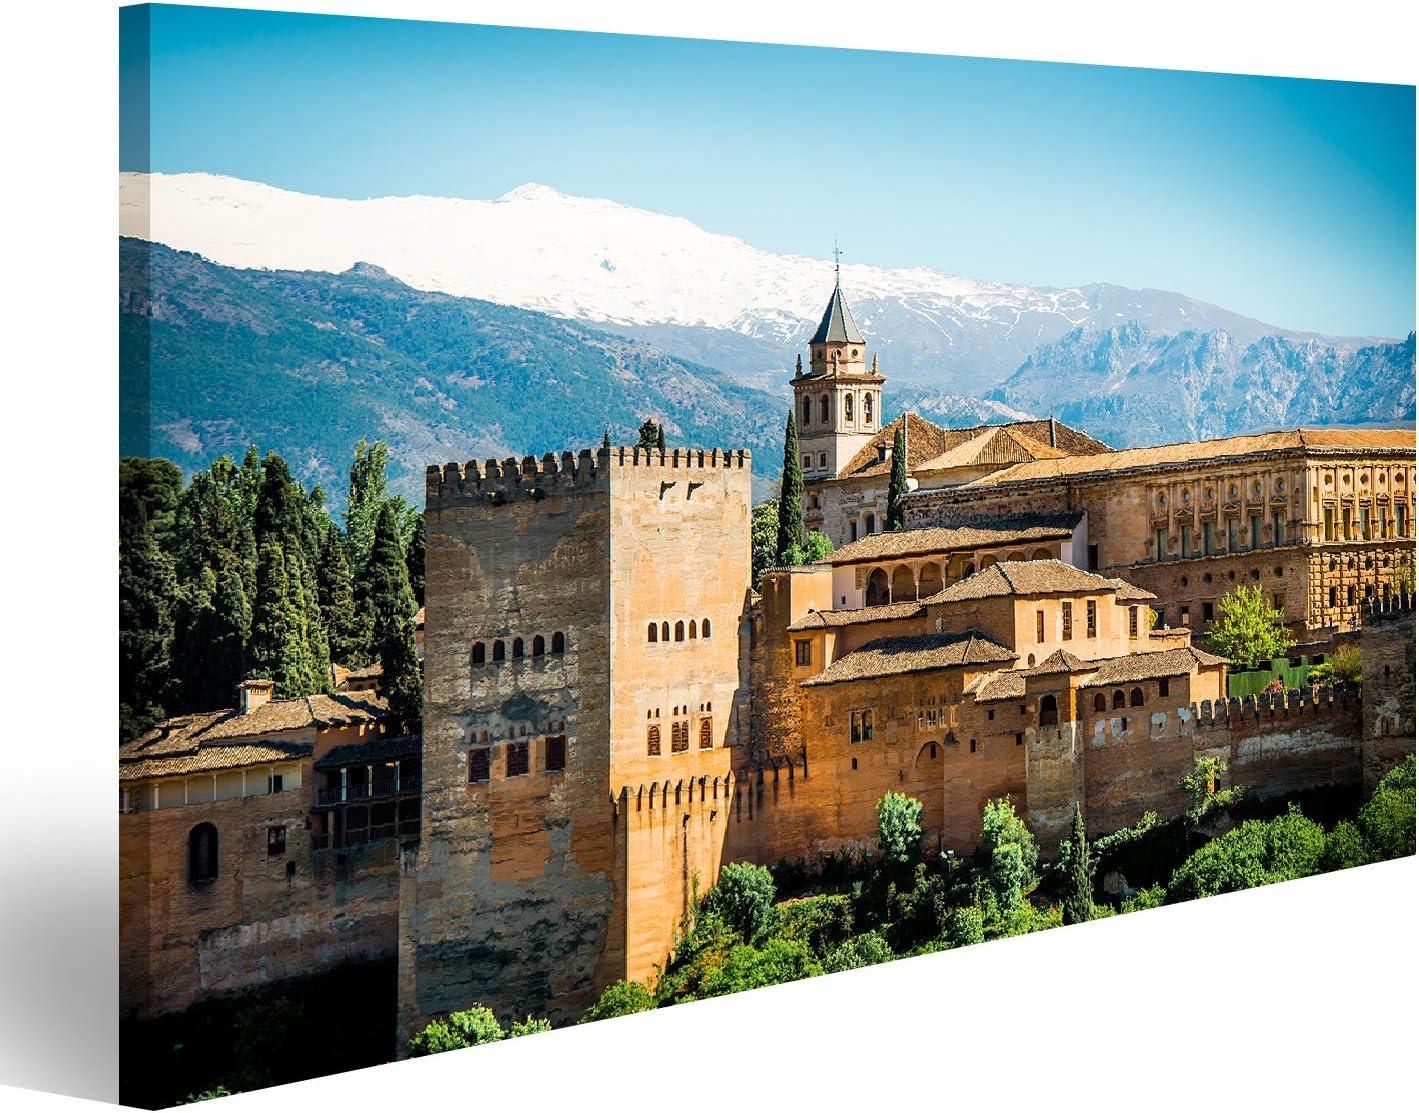 islandburner Cuadro Cuadros Vista de la Famosa Alhambra, Granada ...